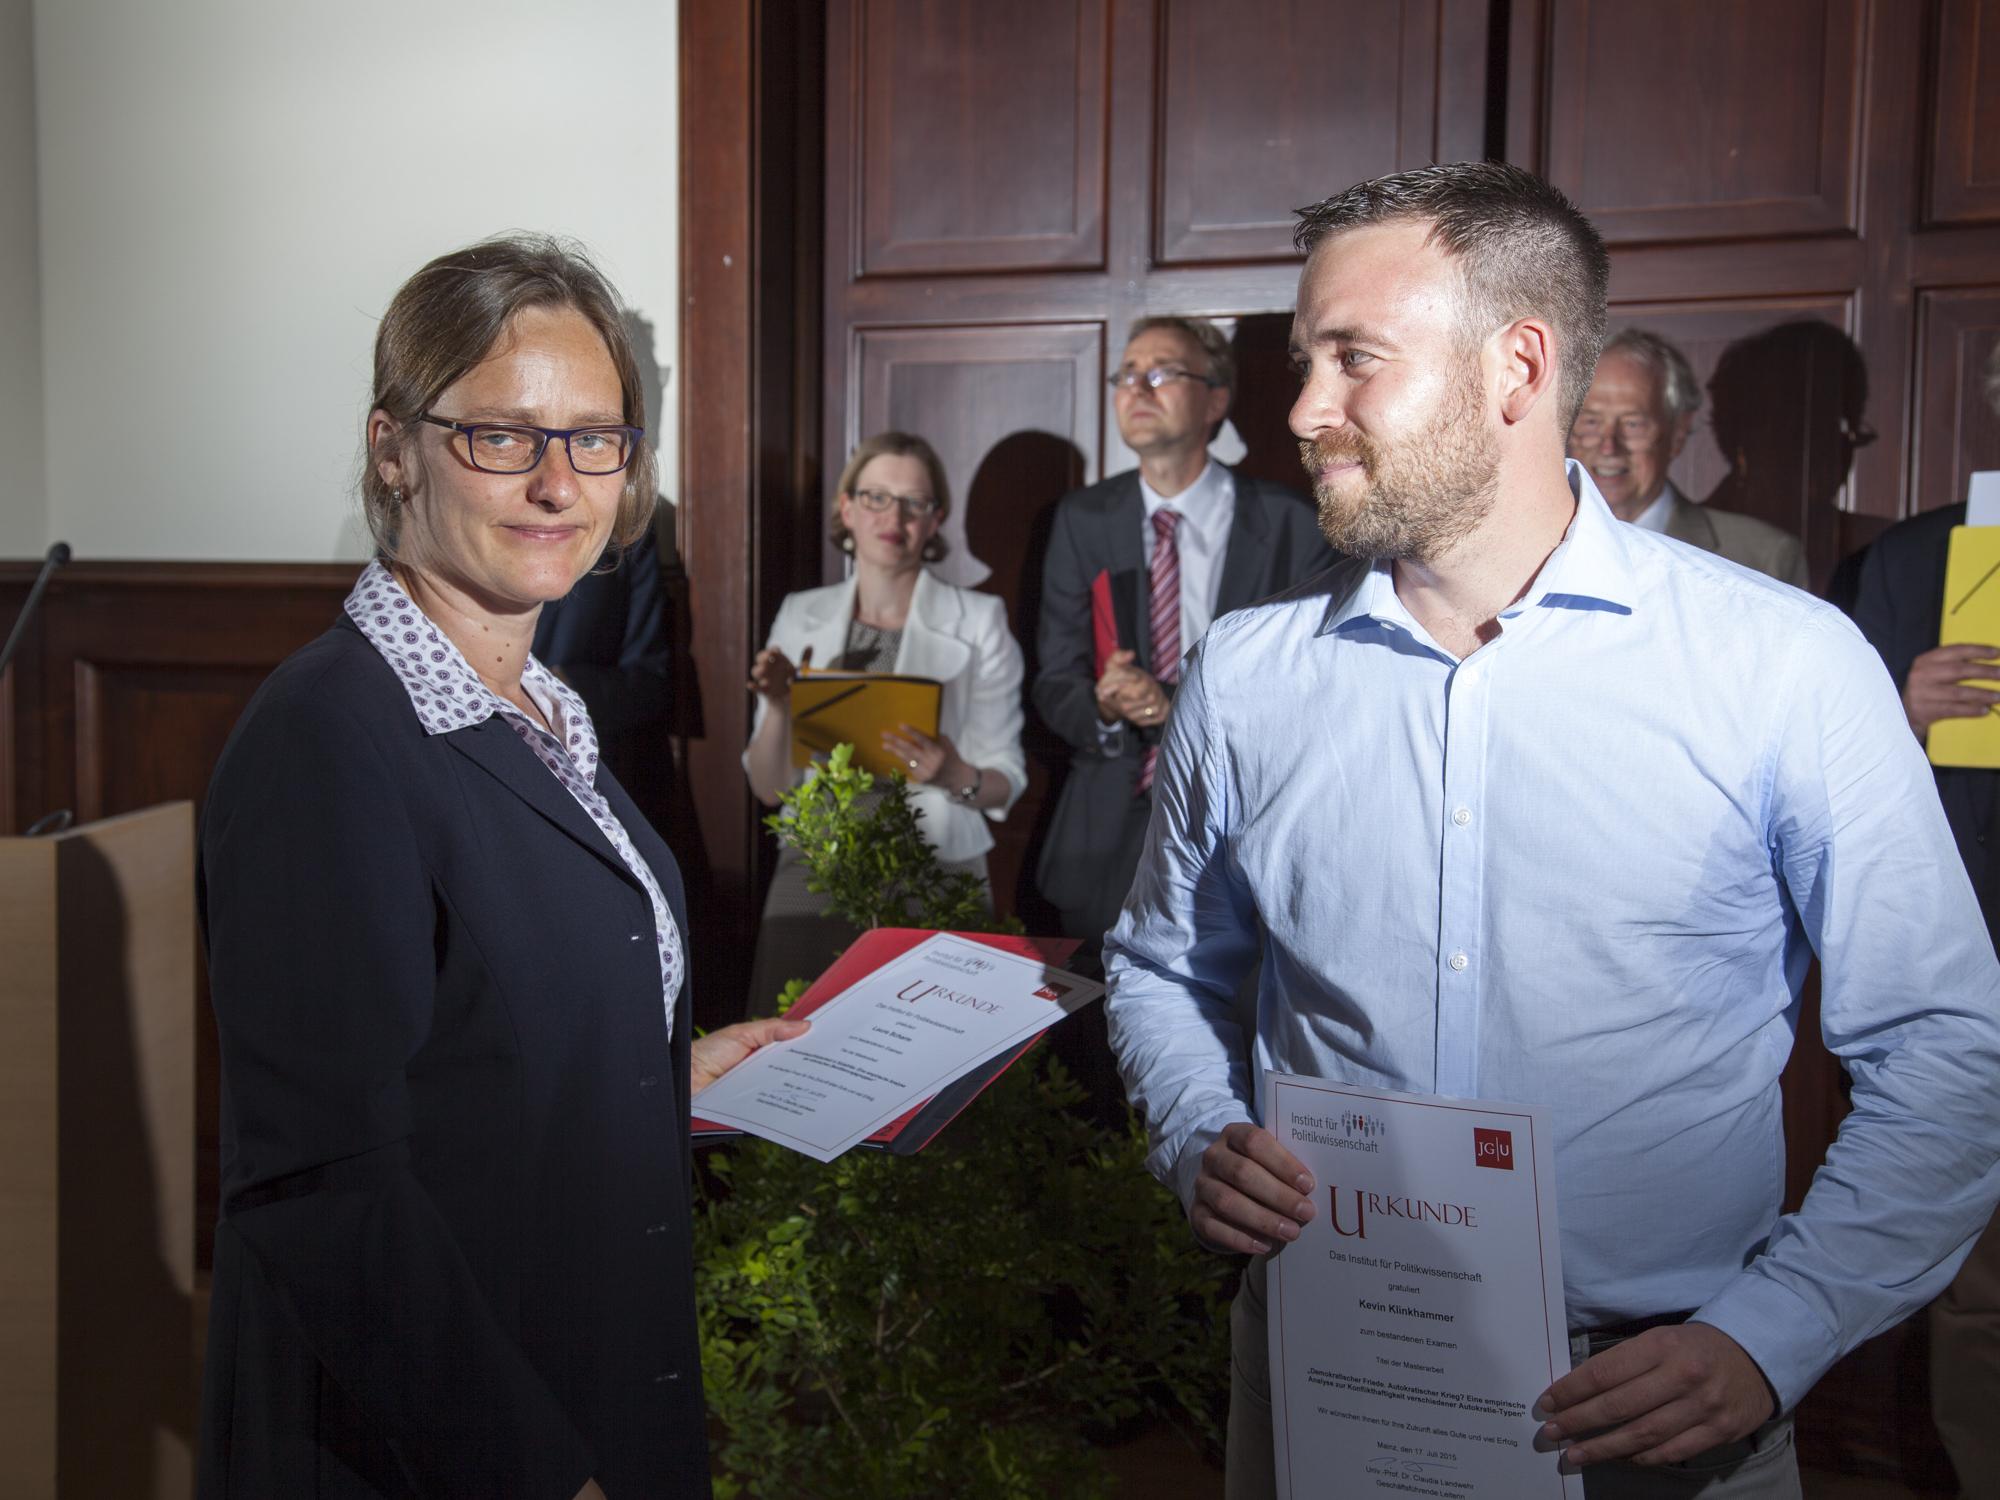 Abschlussfeier Politikwissenschaften (41)